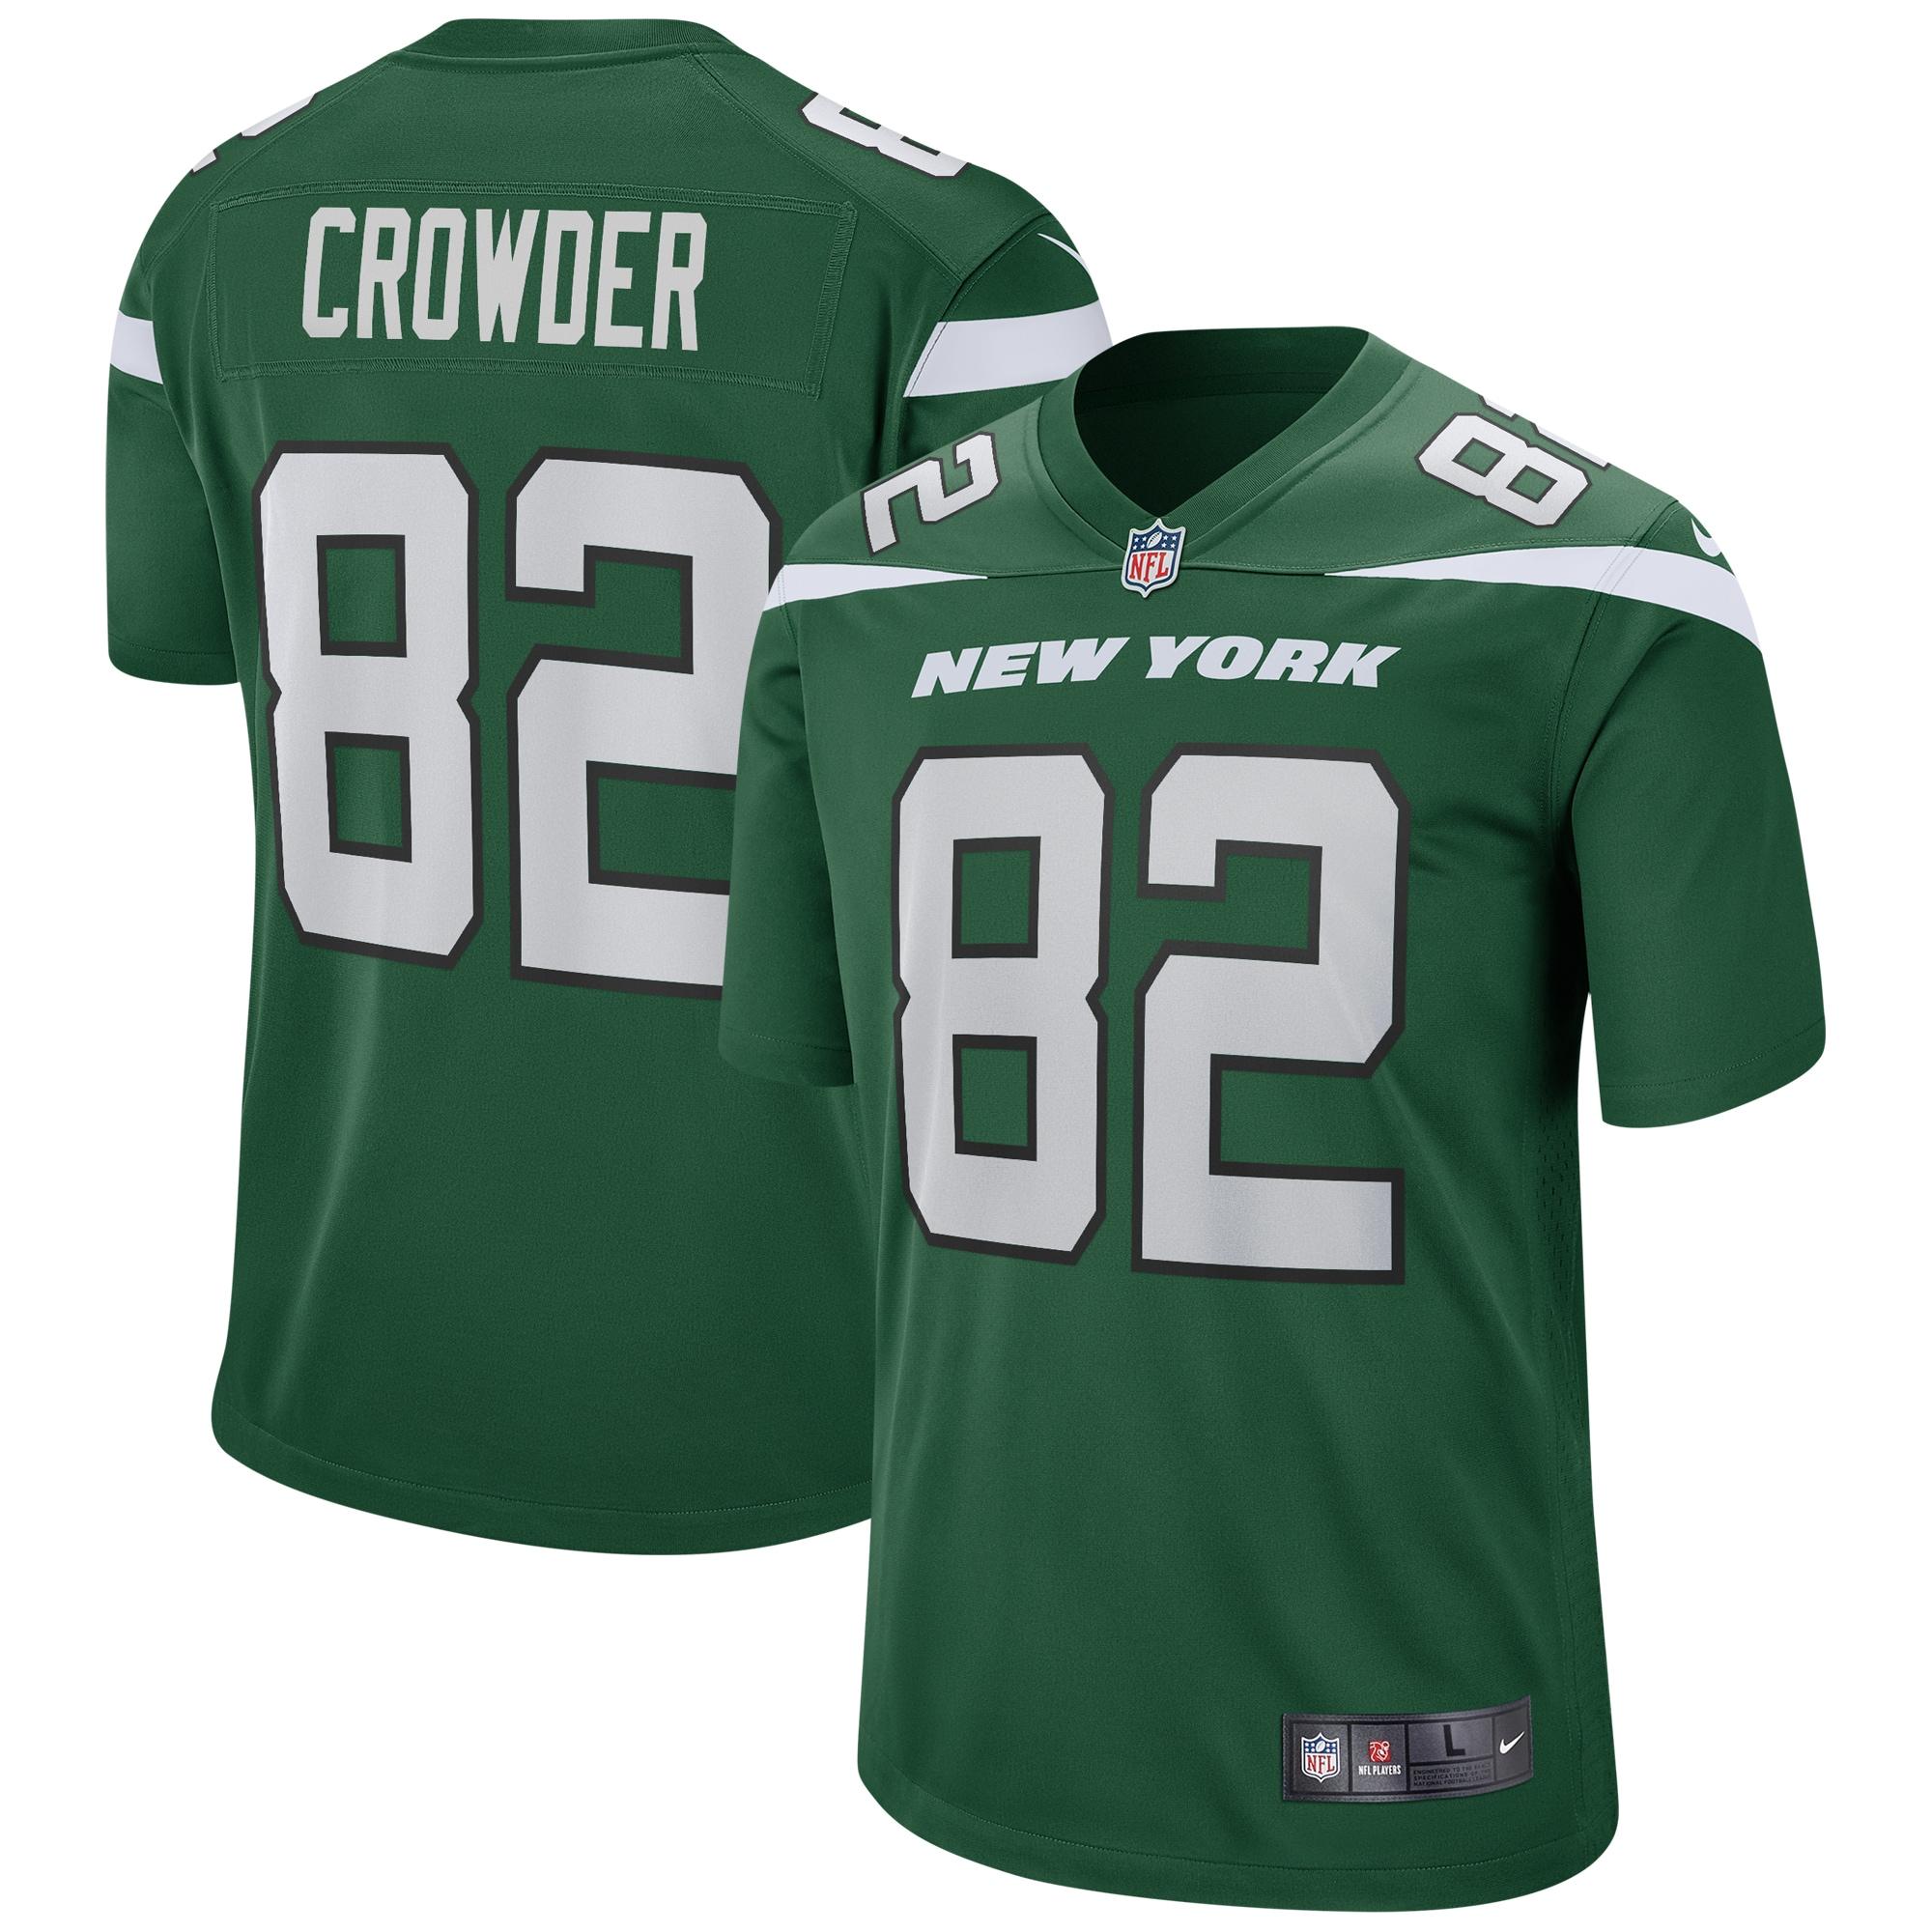 Jamison Crowder New York Jets Nike Game Jersey - Gotham Green - Walmart.com